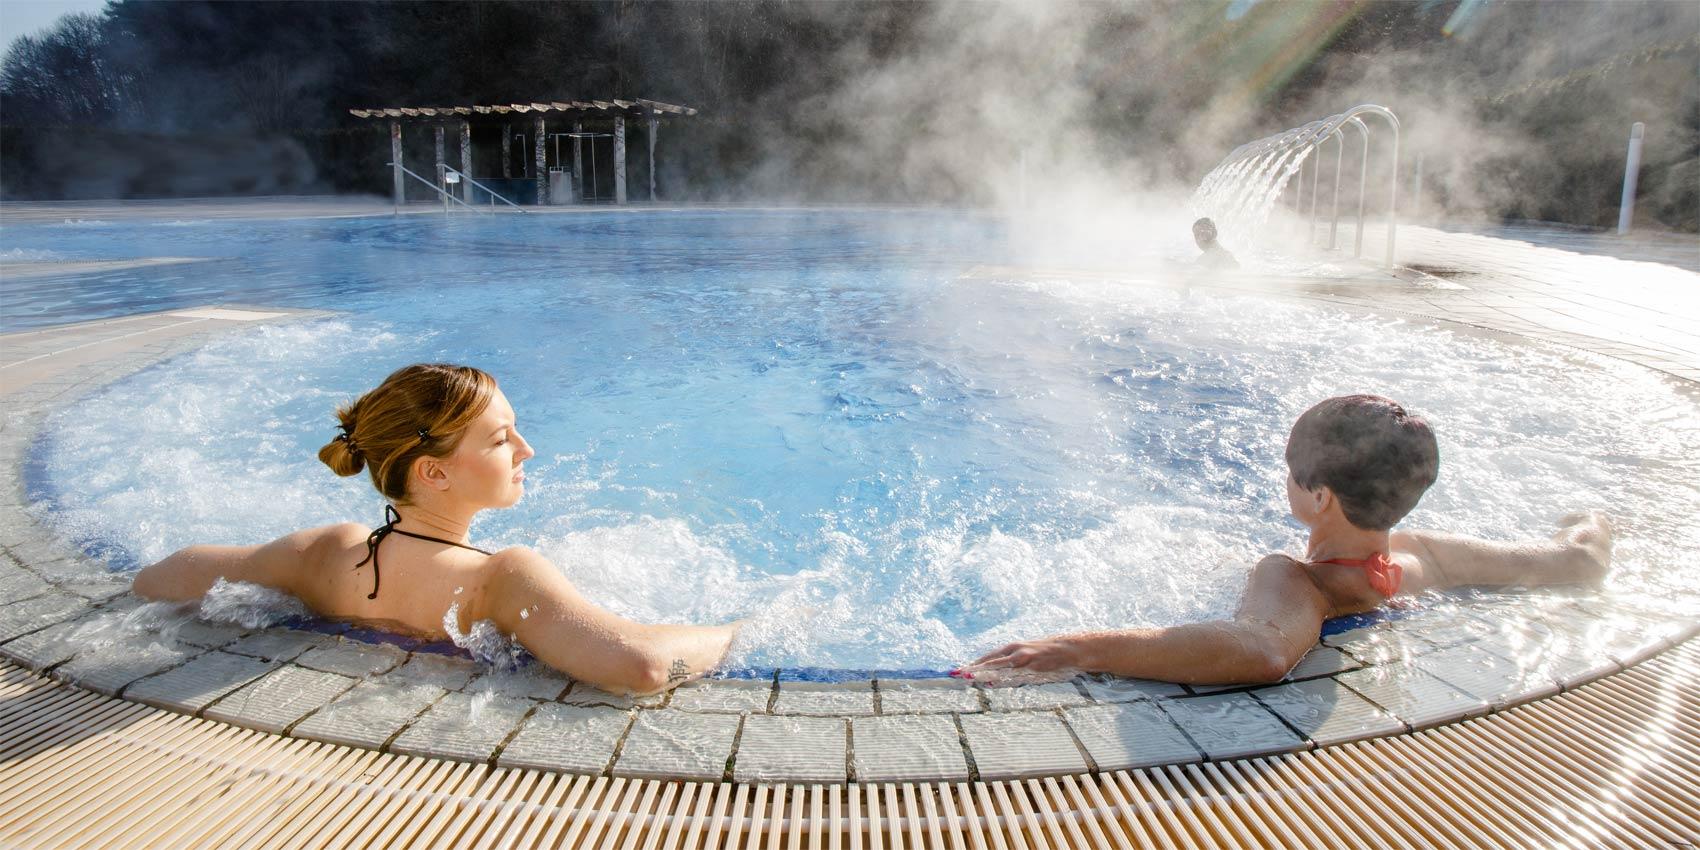 Prezzi caldi per l 39 inverno alle terme marje ke toplice - Piscine gia pronte prezzi ...